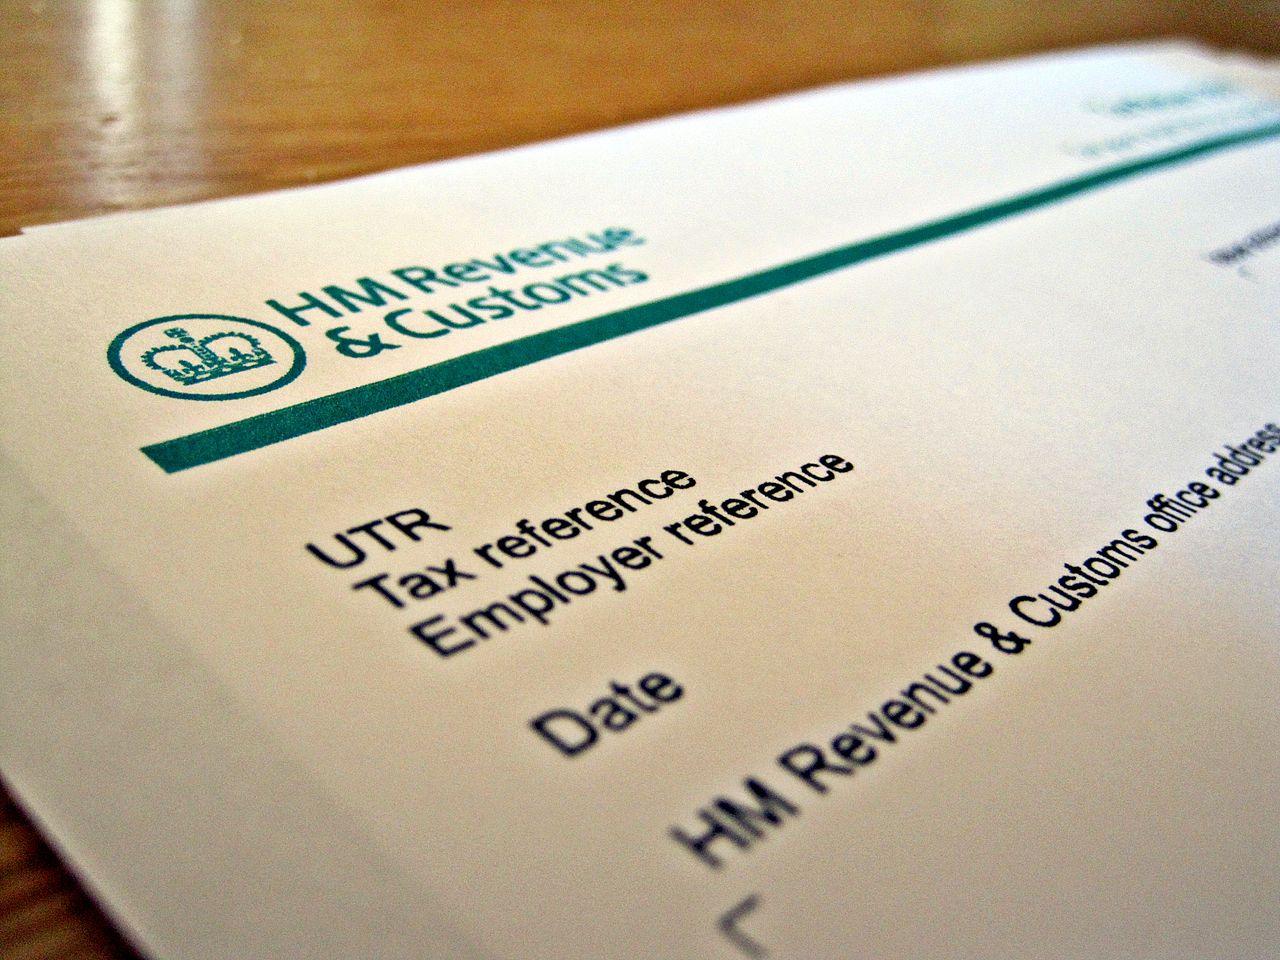 Image of Tax Return